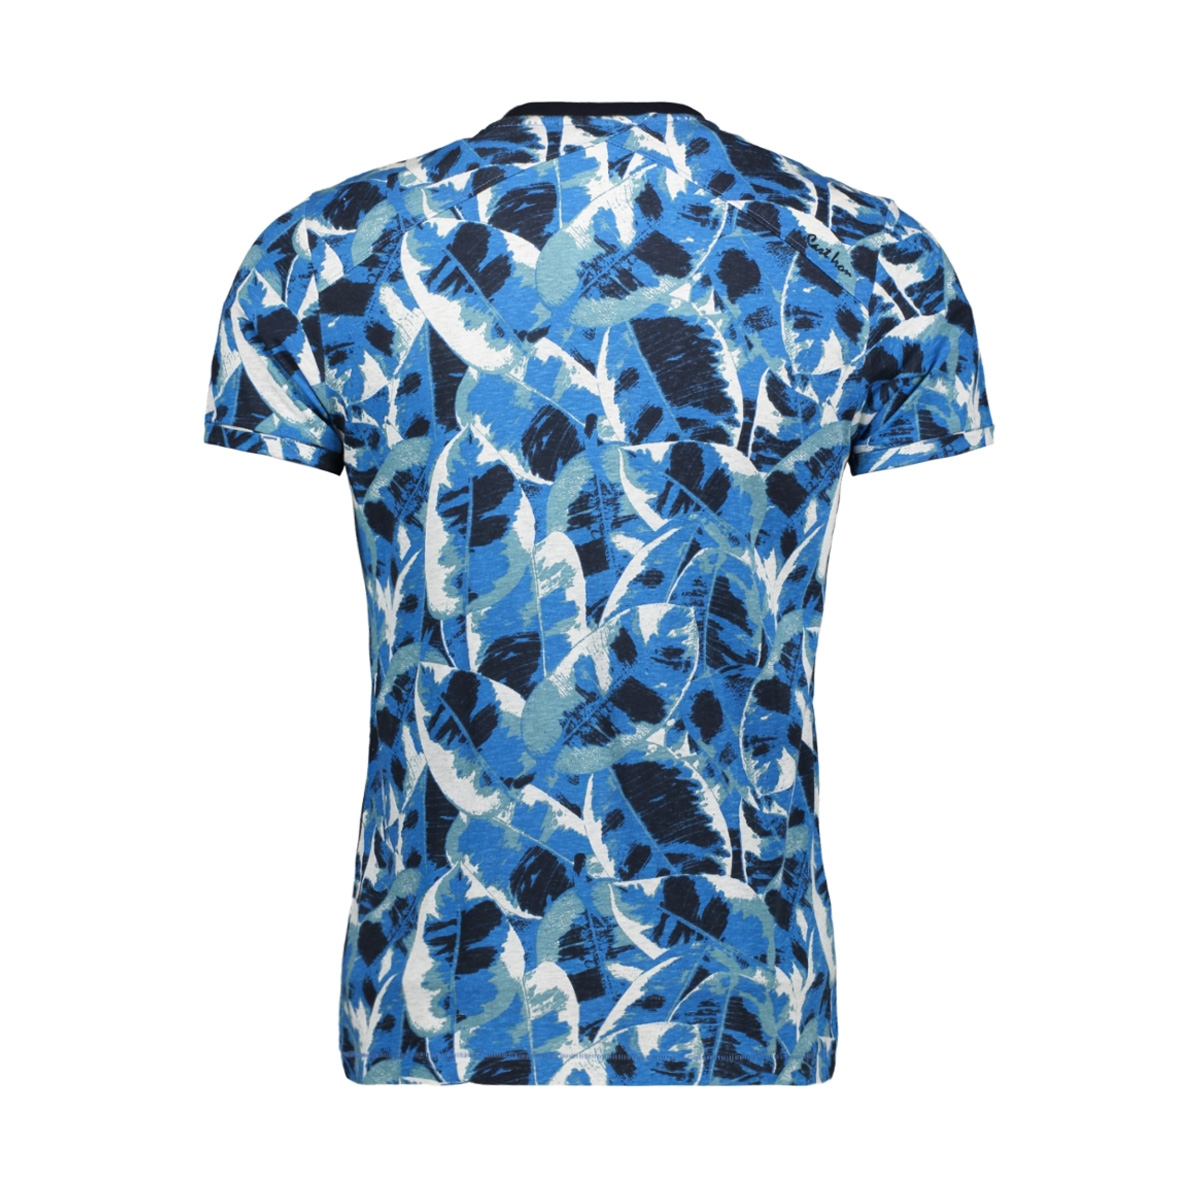 leaf camoufage t shirt ctss193307 cast iron t-shirt 5307